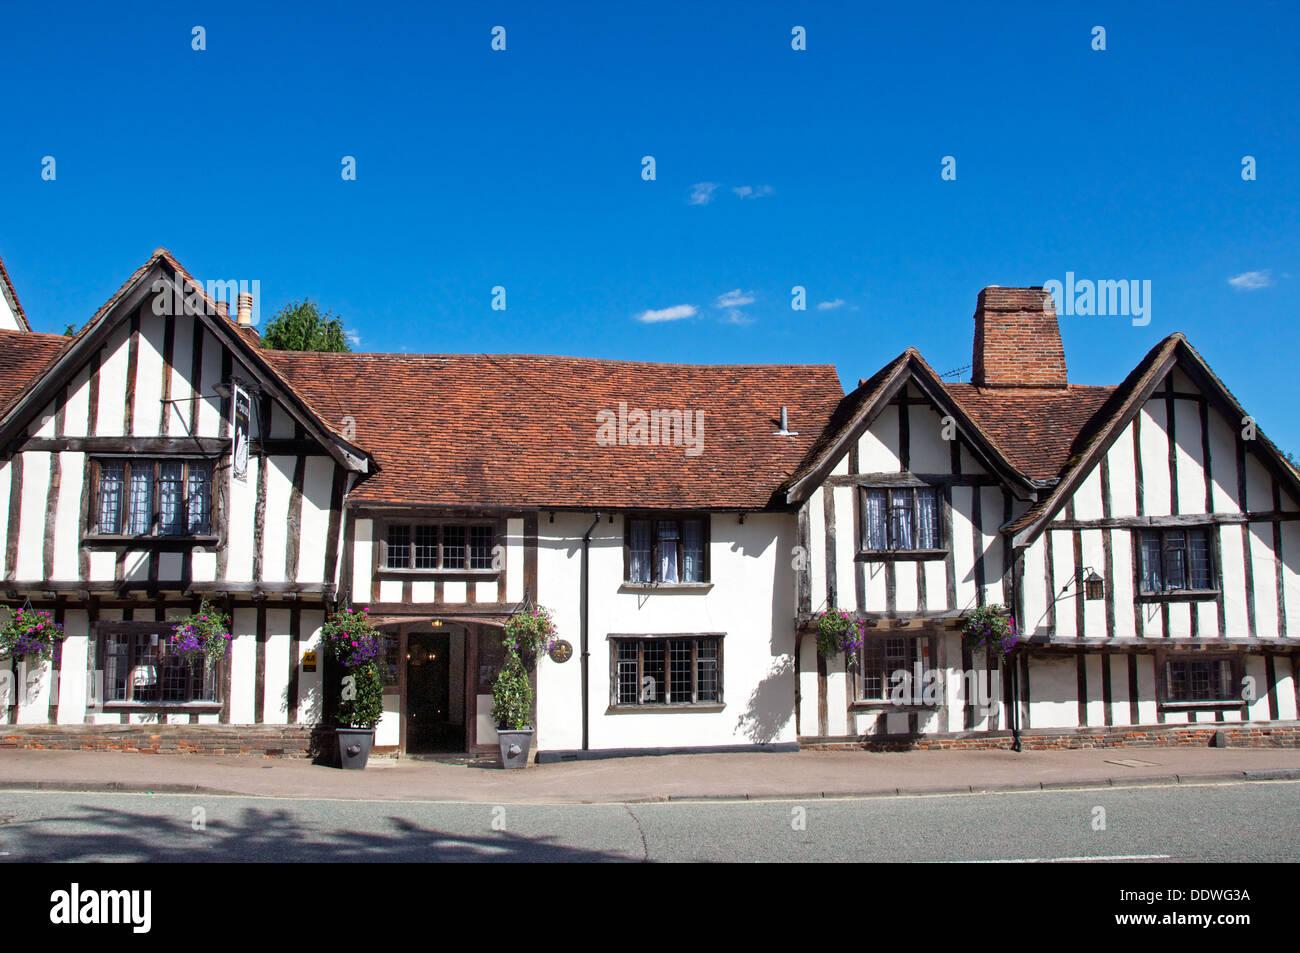 Swan Hotel High Street Lavenham Suffolk England - Stock Image